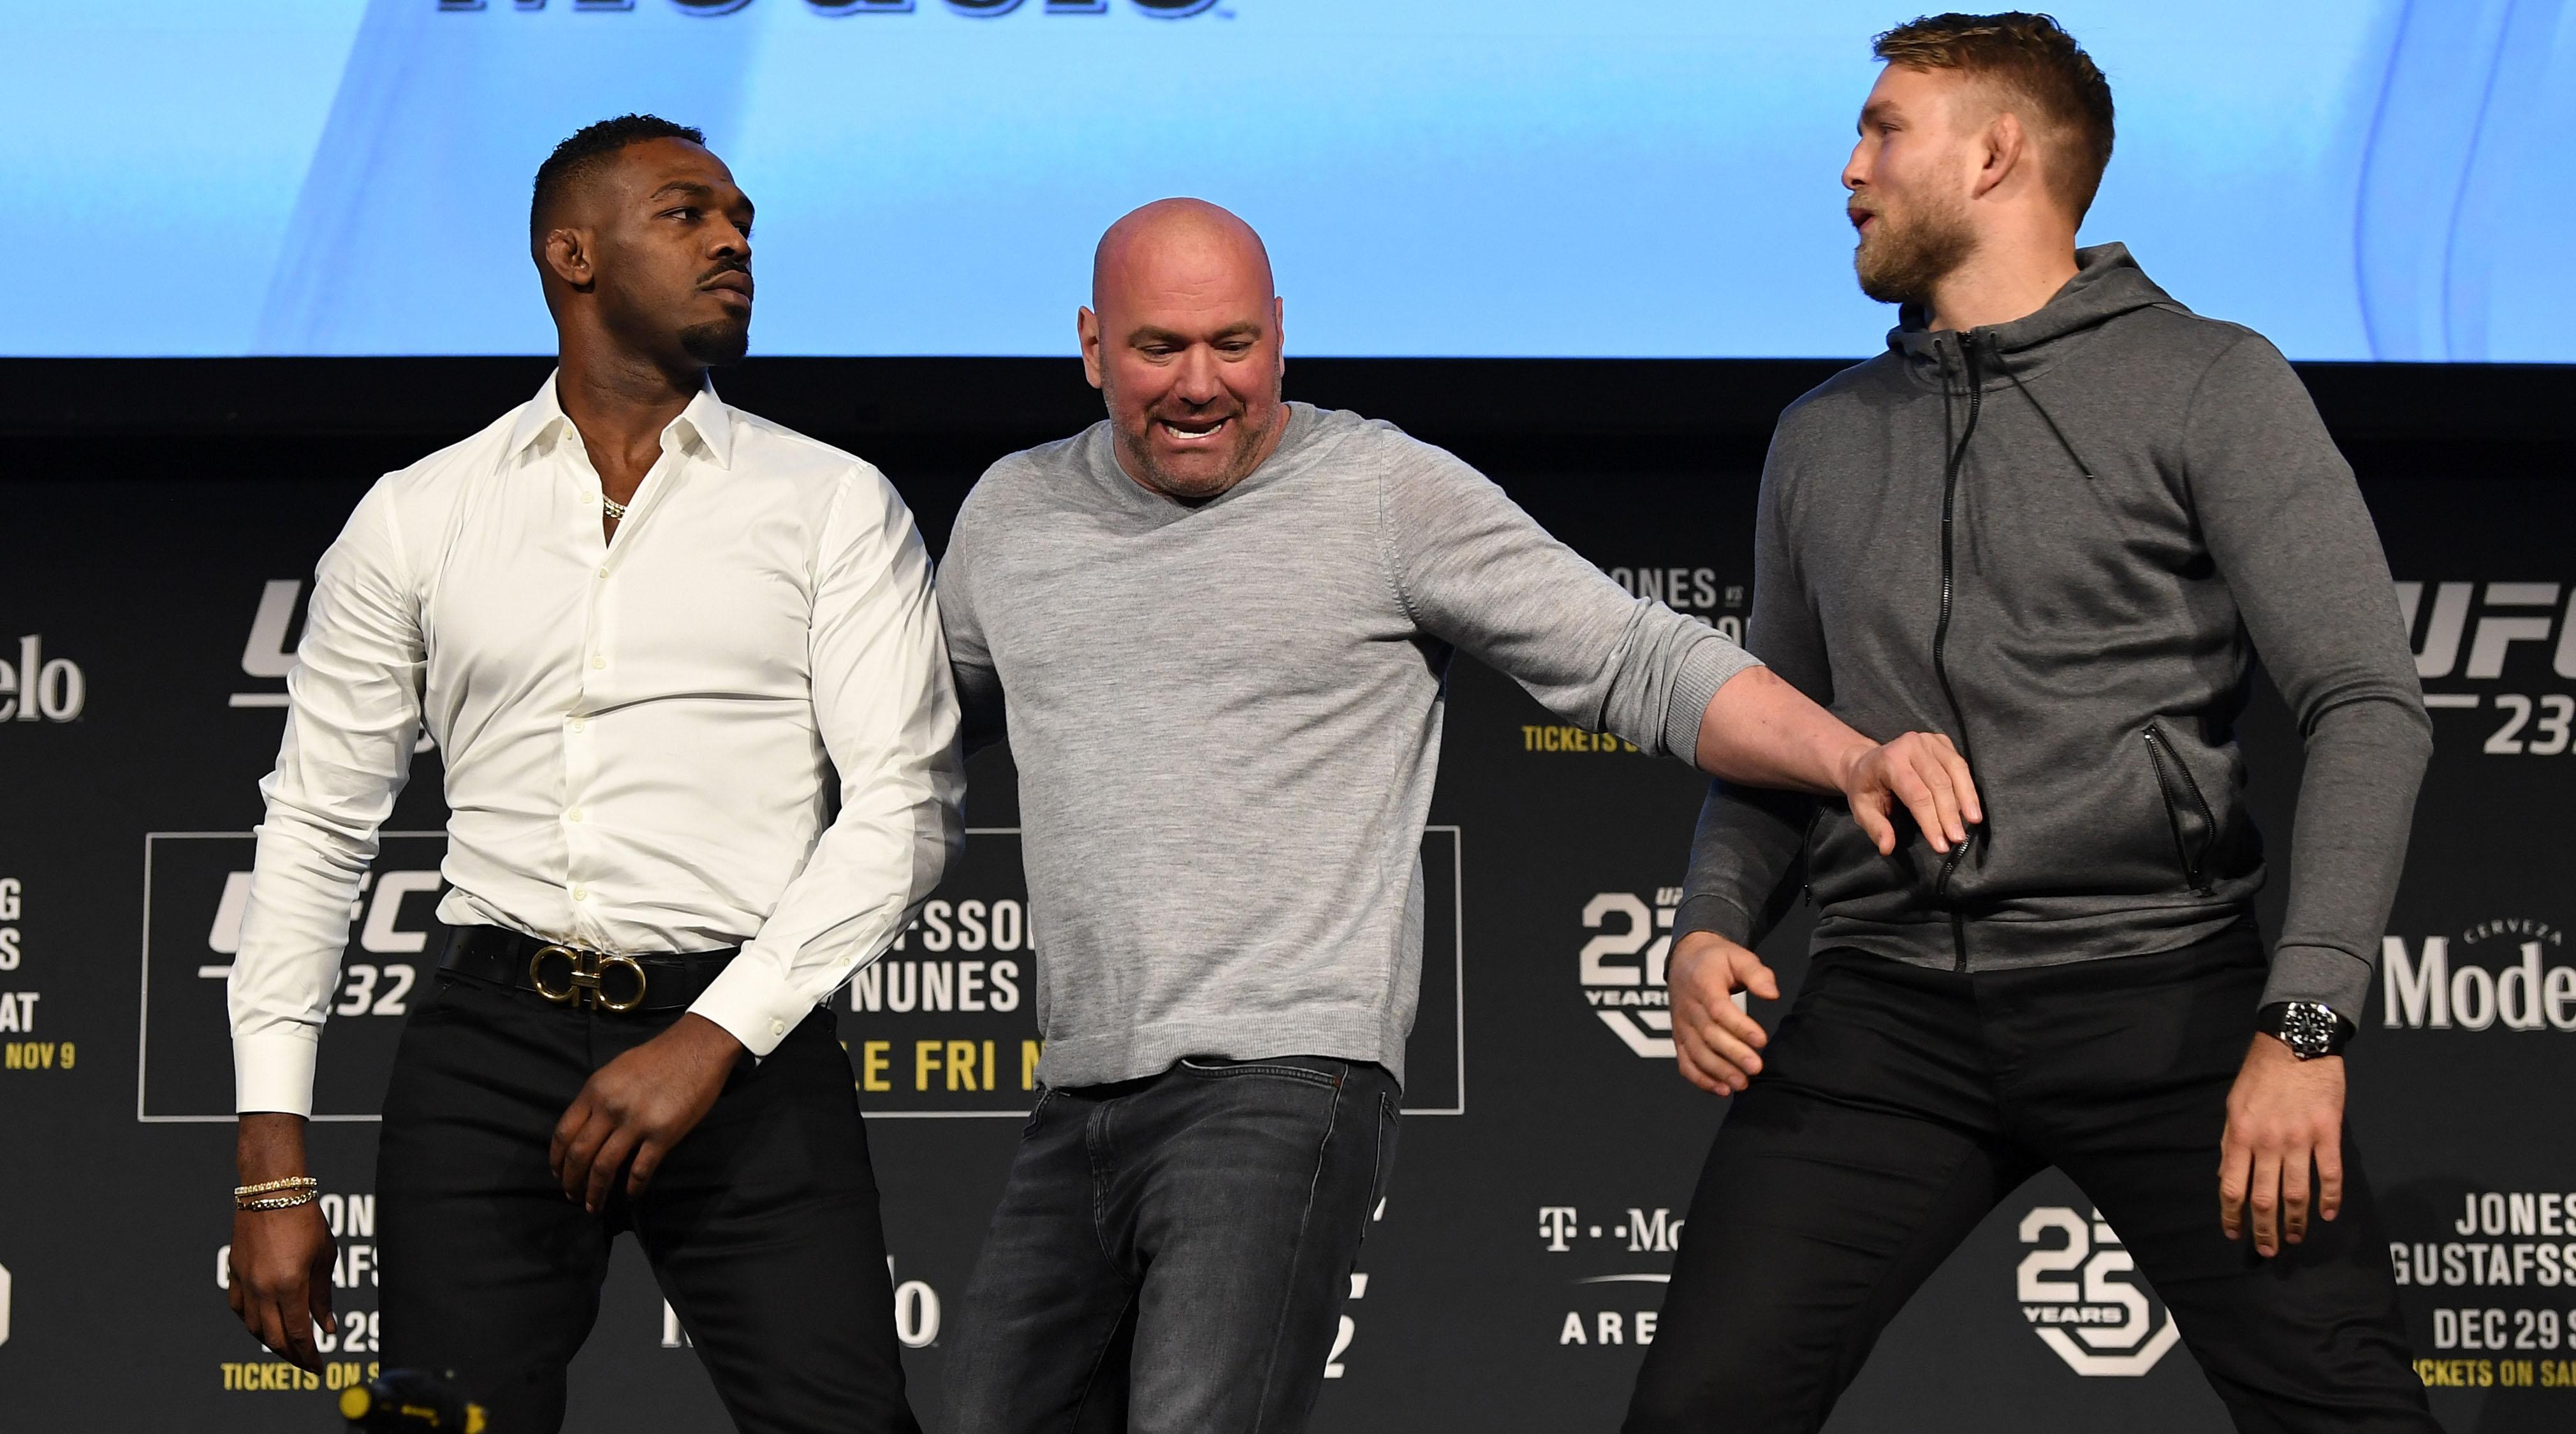 UFC 232 moved because of Jon Jones